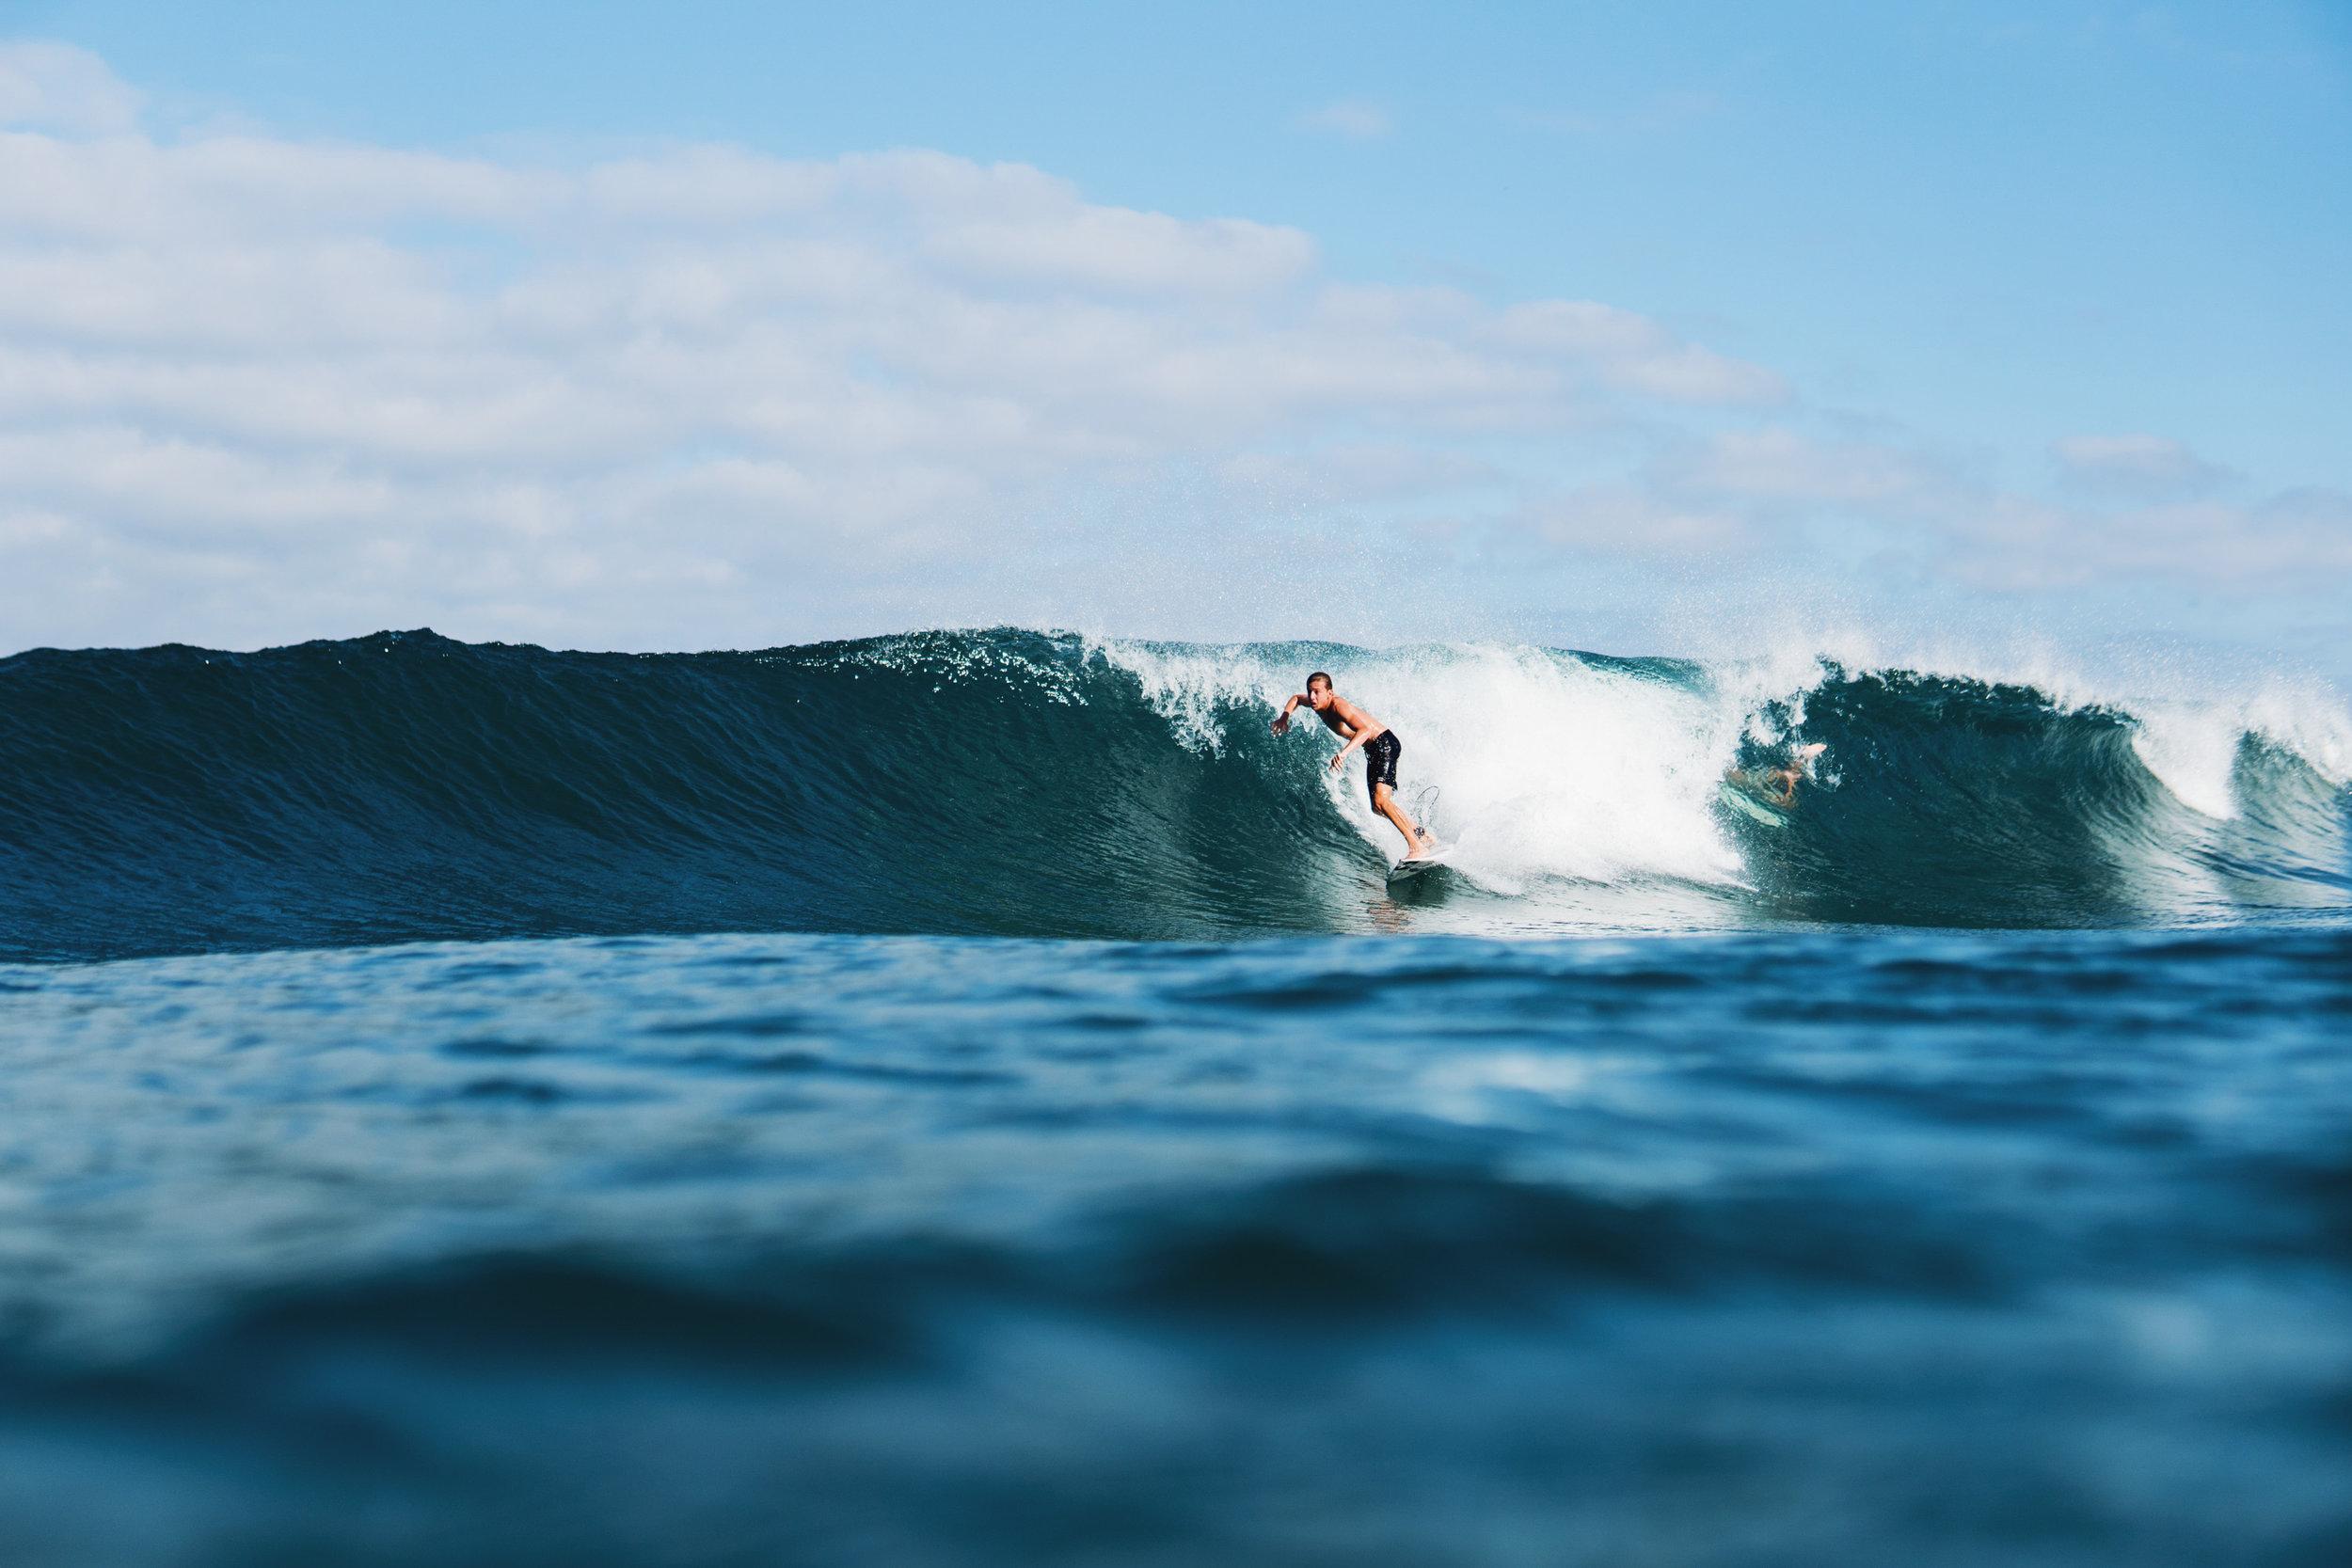 Surf-Mexico-Zihuatanejo-Sayulita-Ixtapa-Zihuatanejo-Diego-Cadena-Olas-Fotografia-Heiko-Bothe-71.jpg